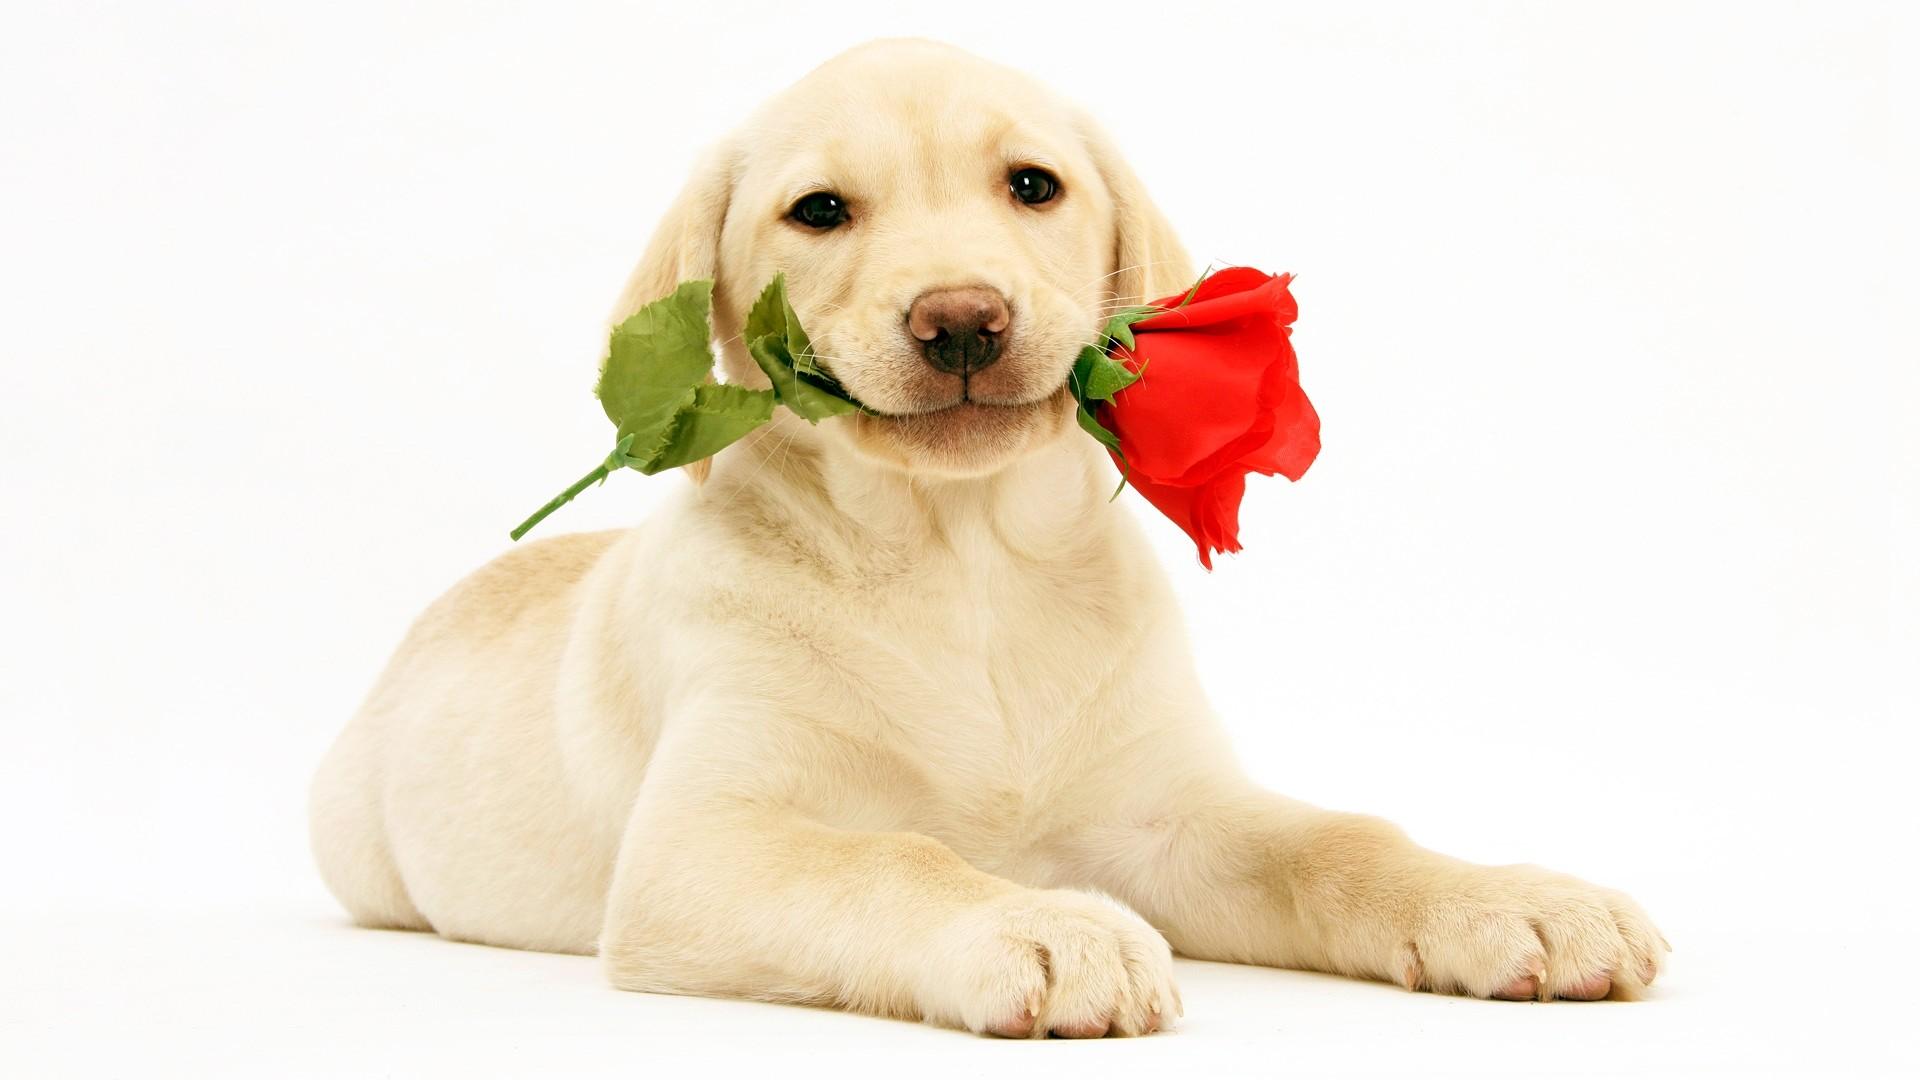 Cute Women's Day hd image download